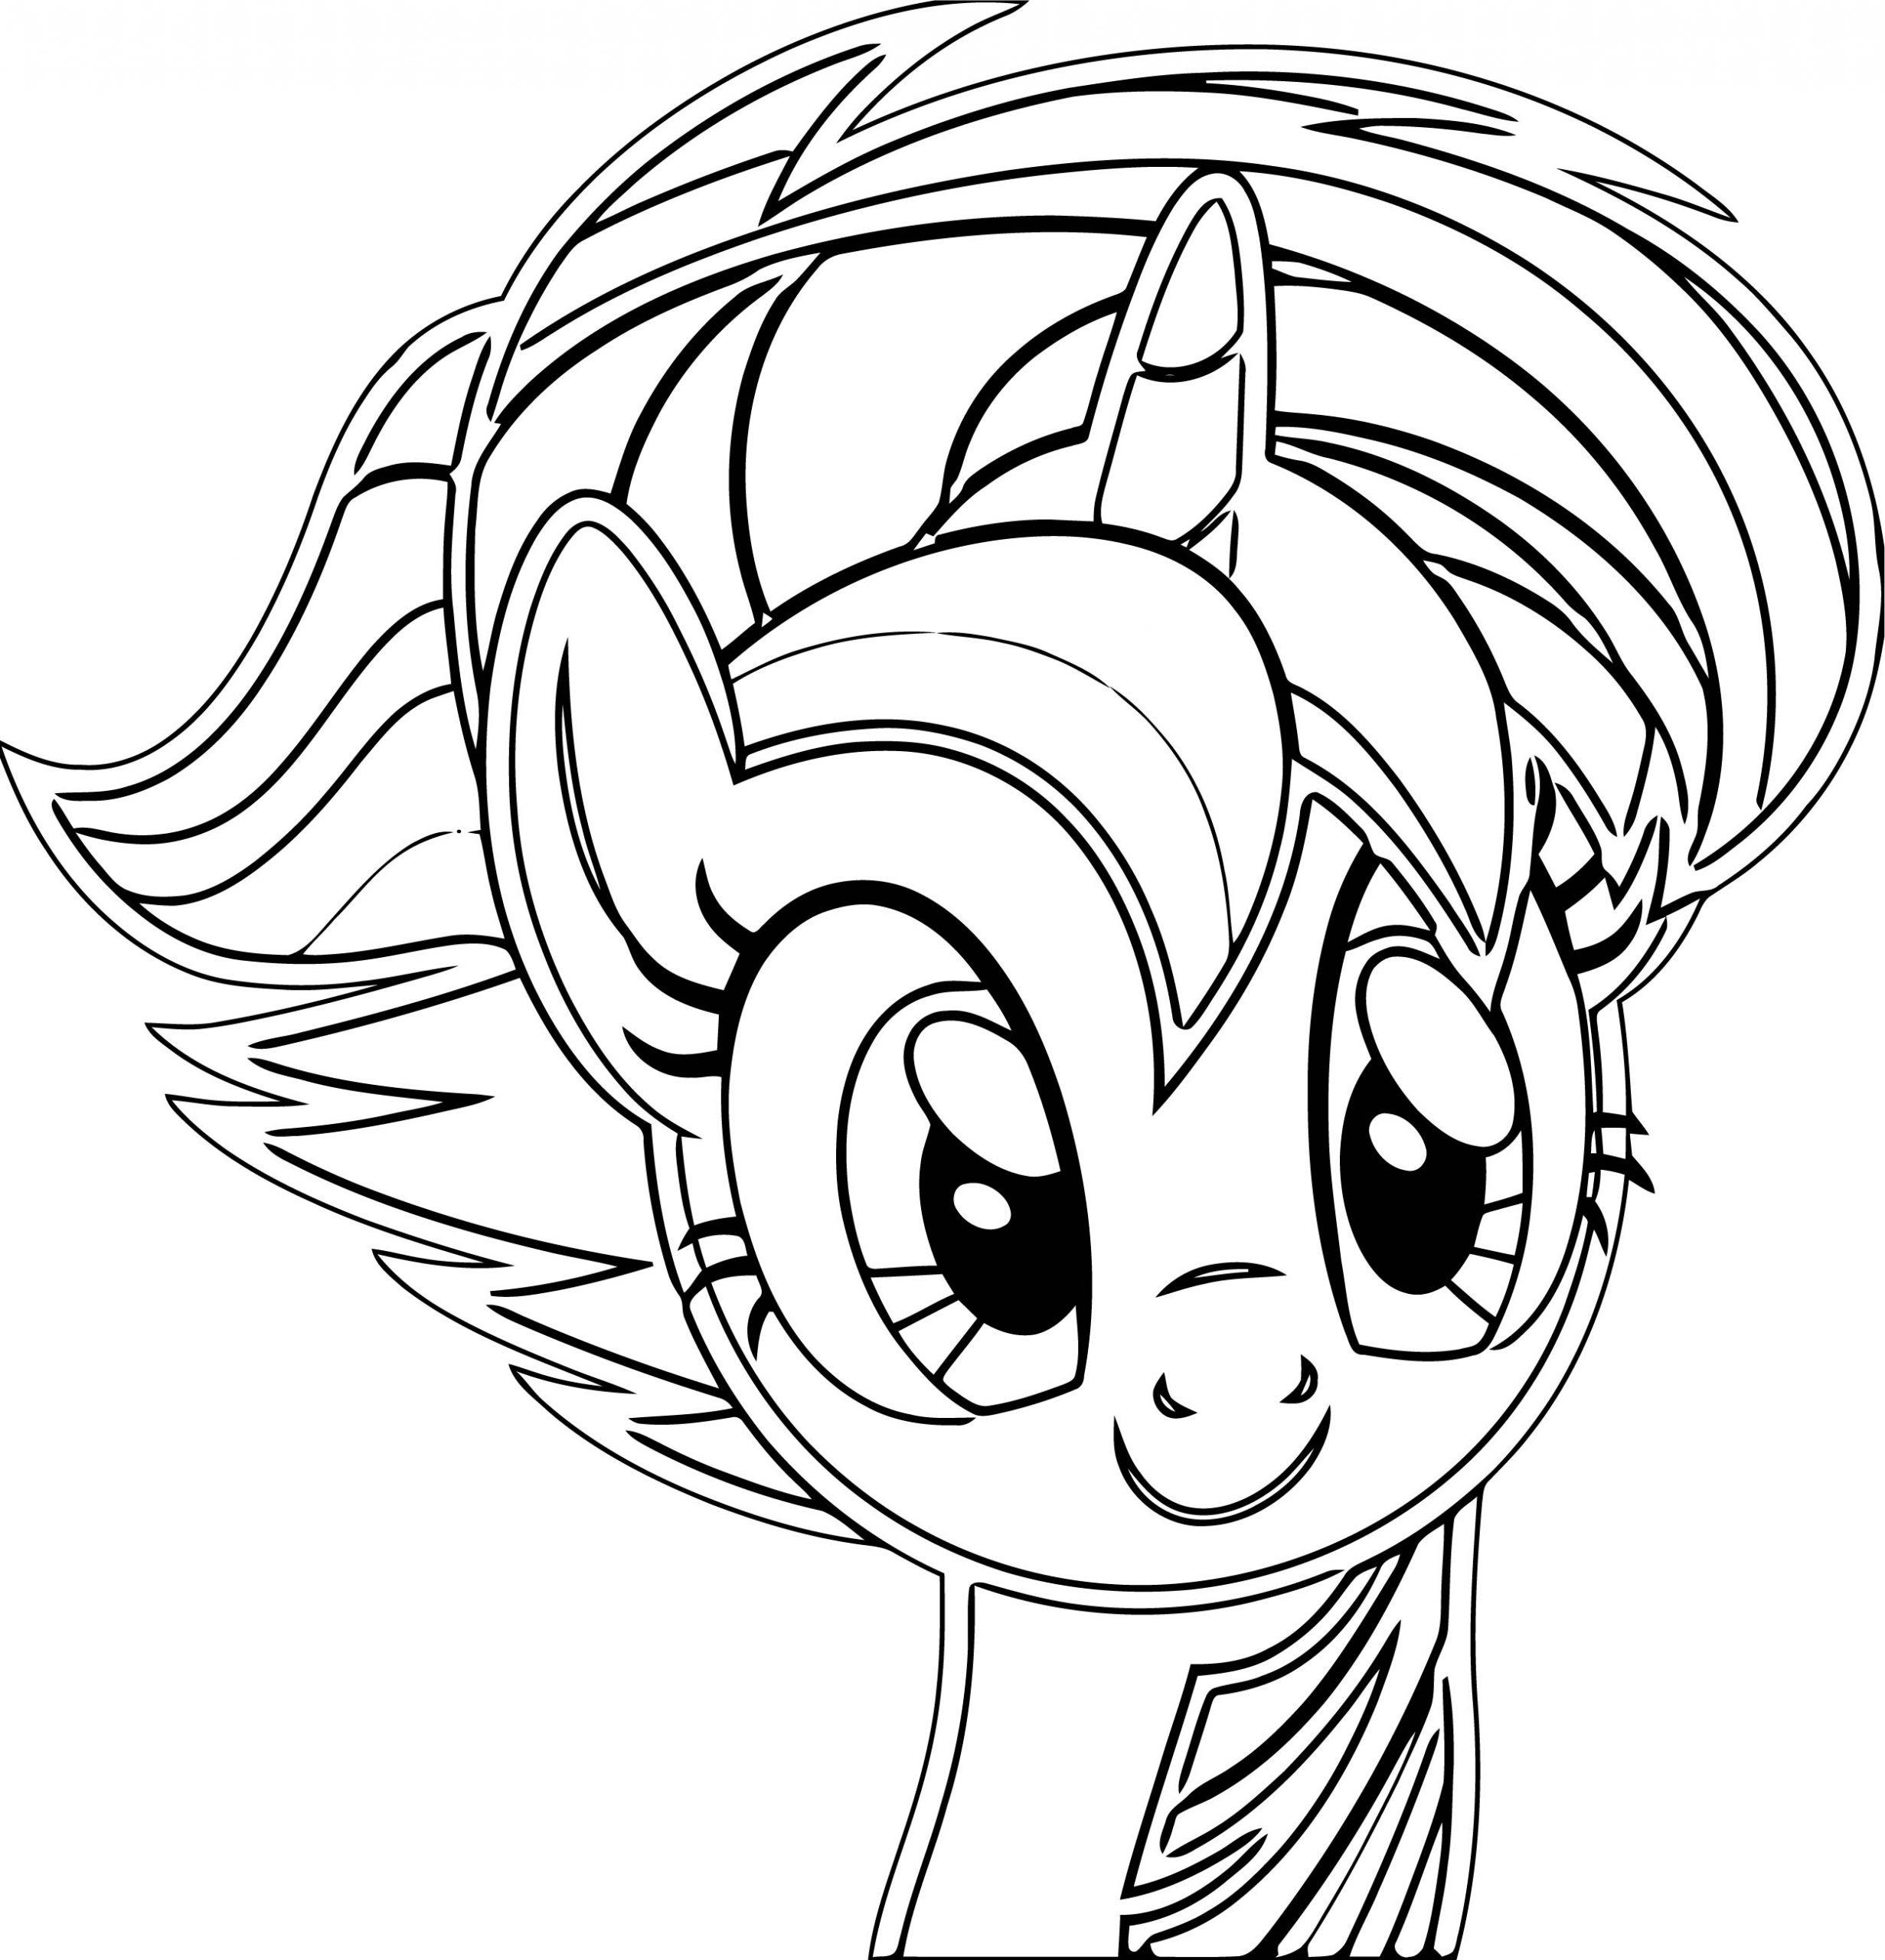 Princess Twilight Sparkle Coloring Page 498